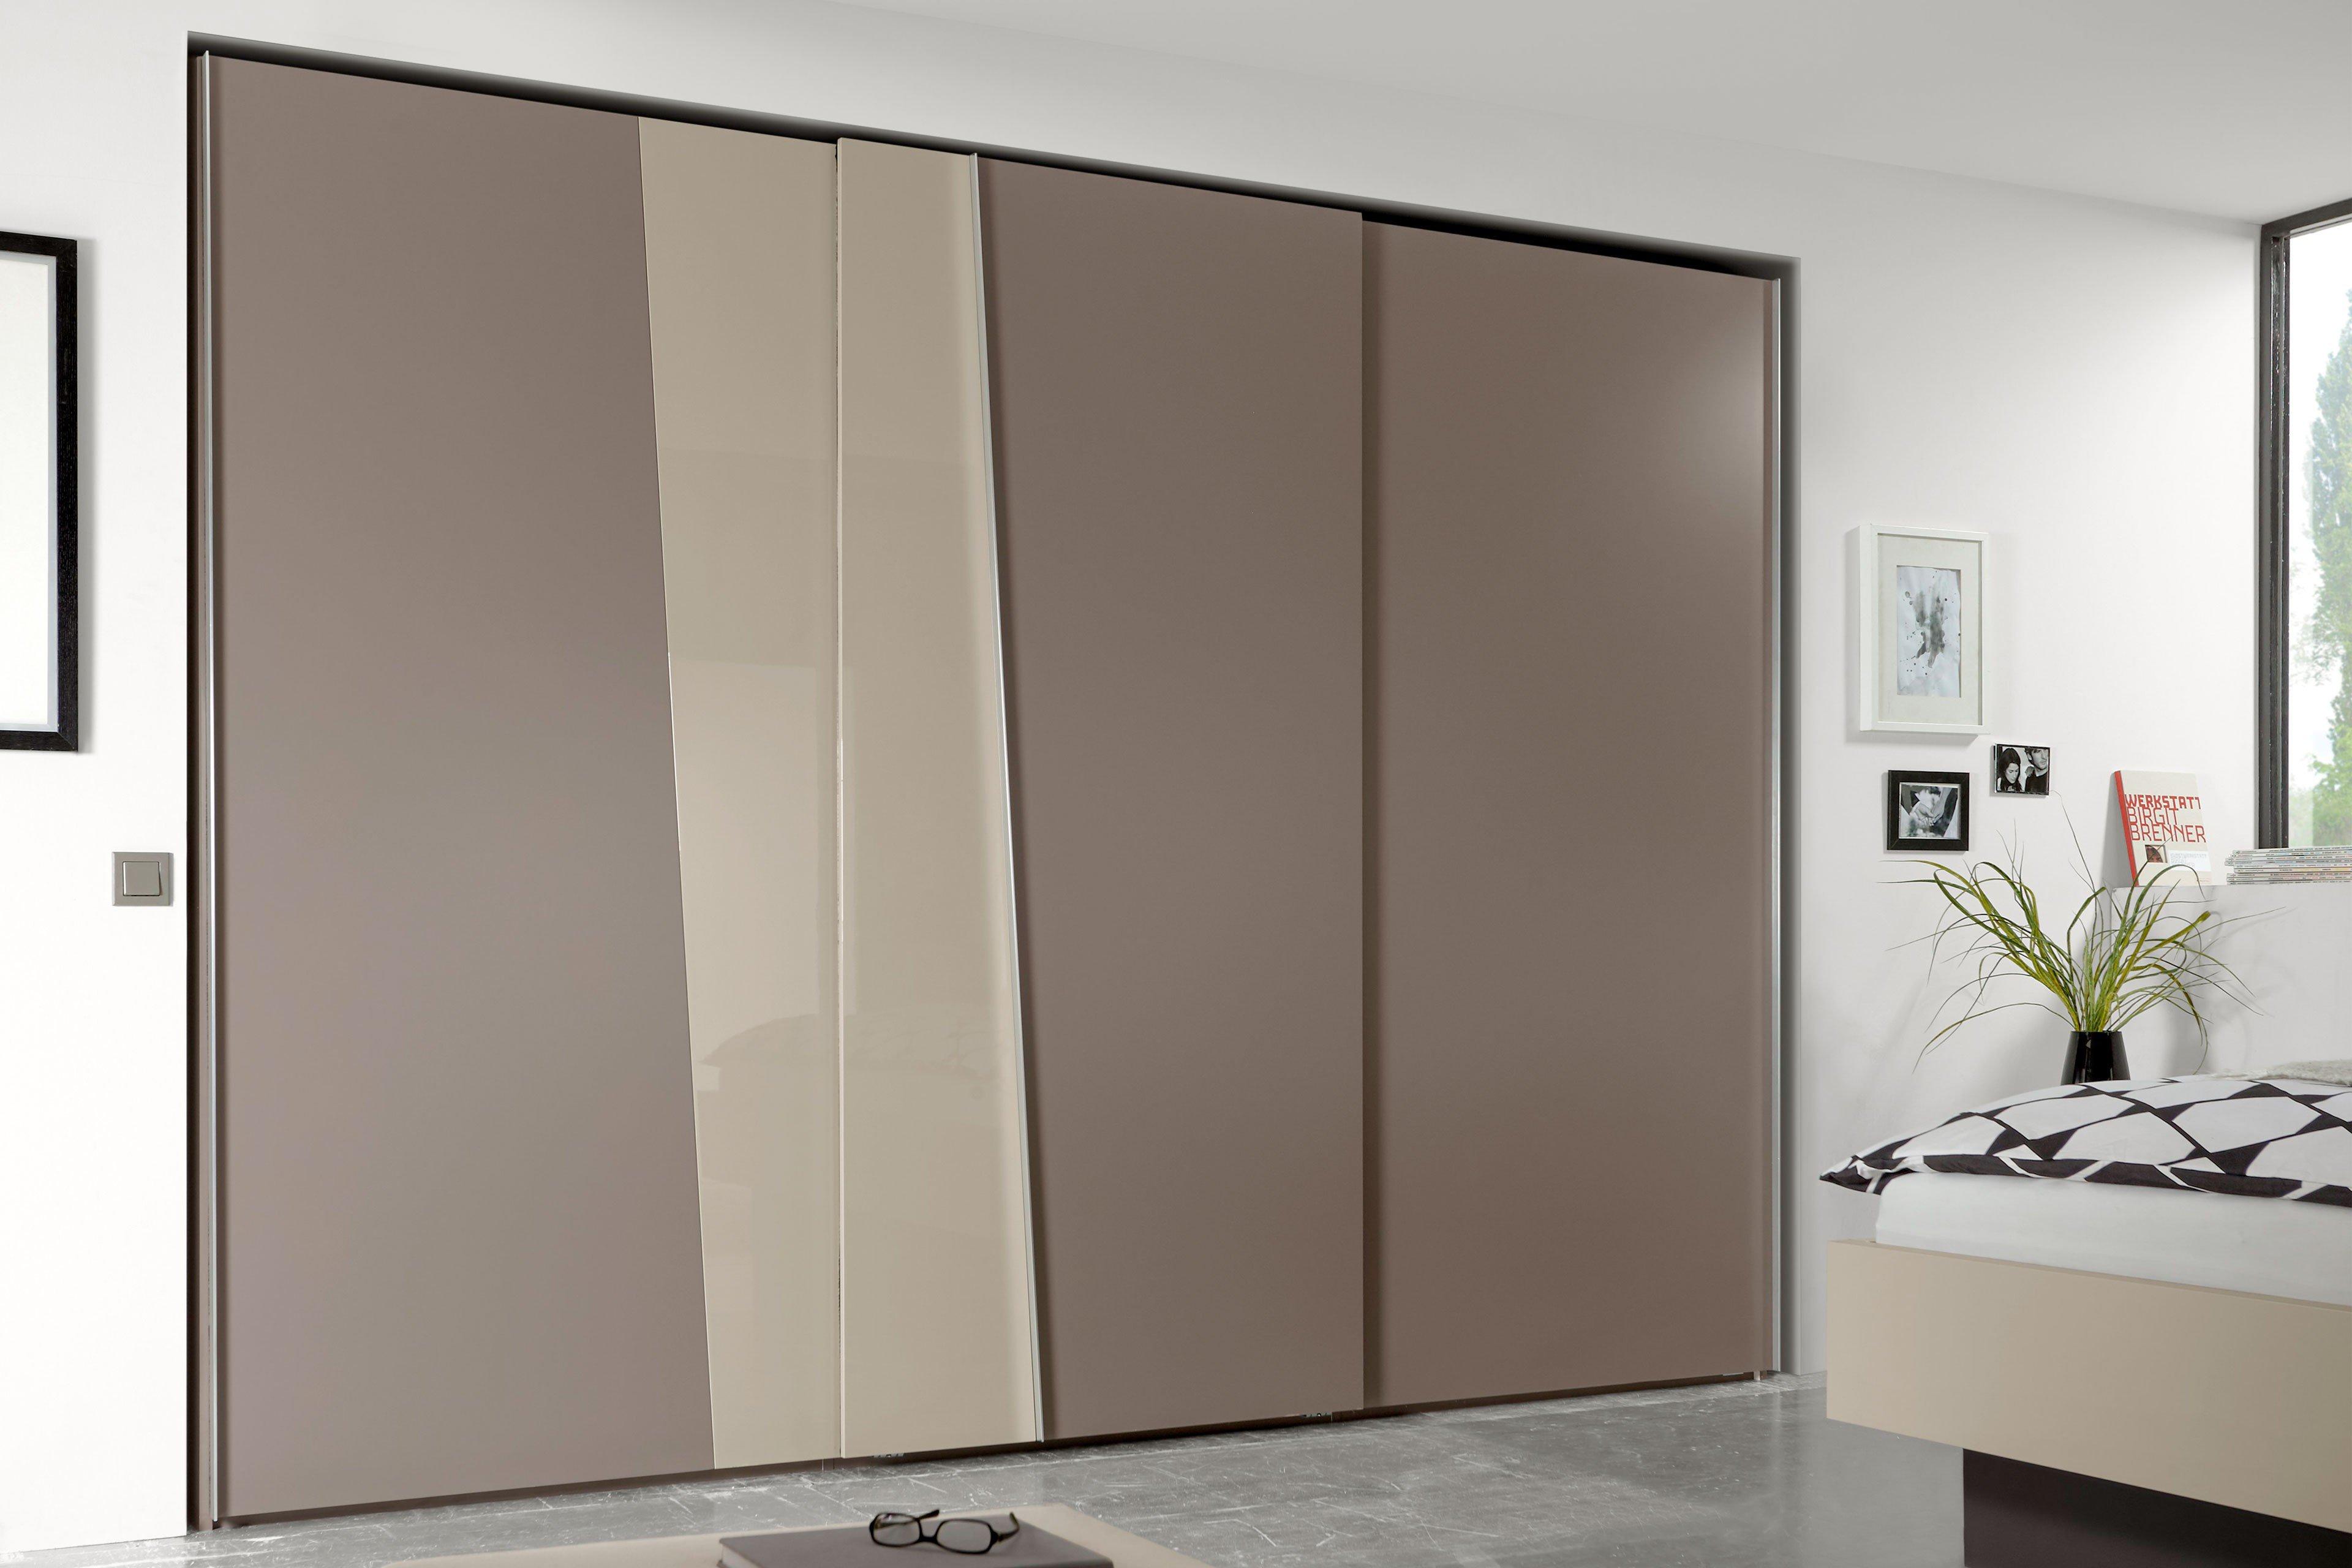 Cubanit Grau Schlafzimmer Wohndesign